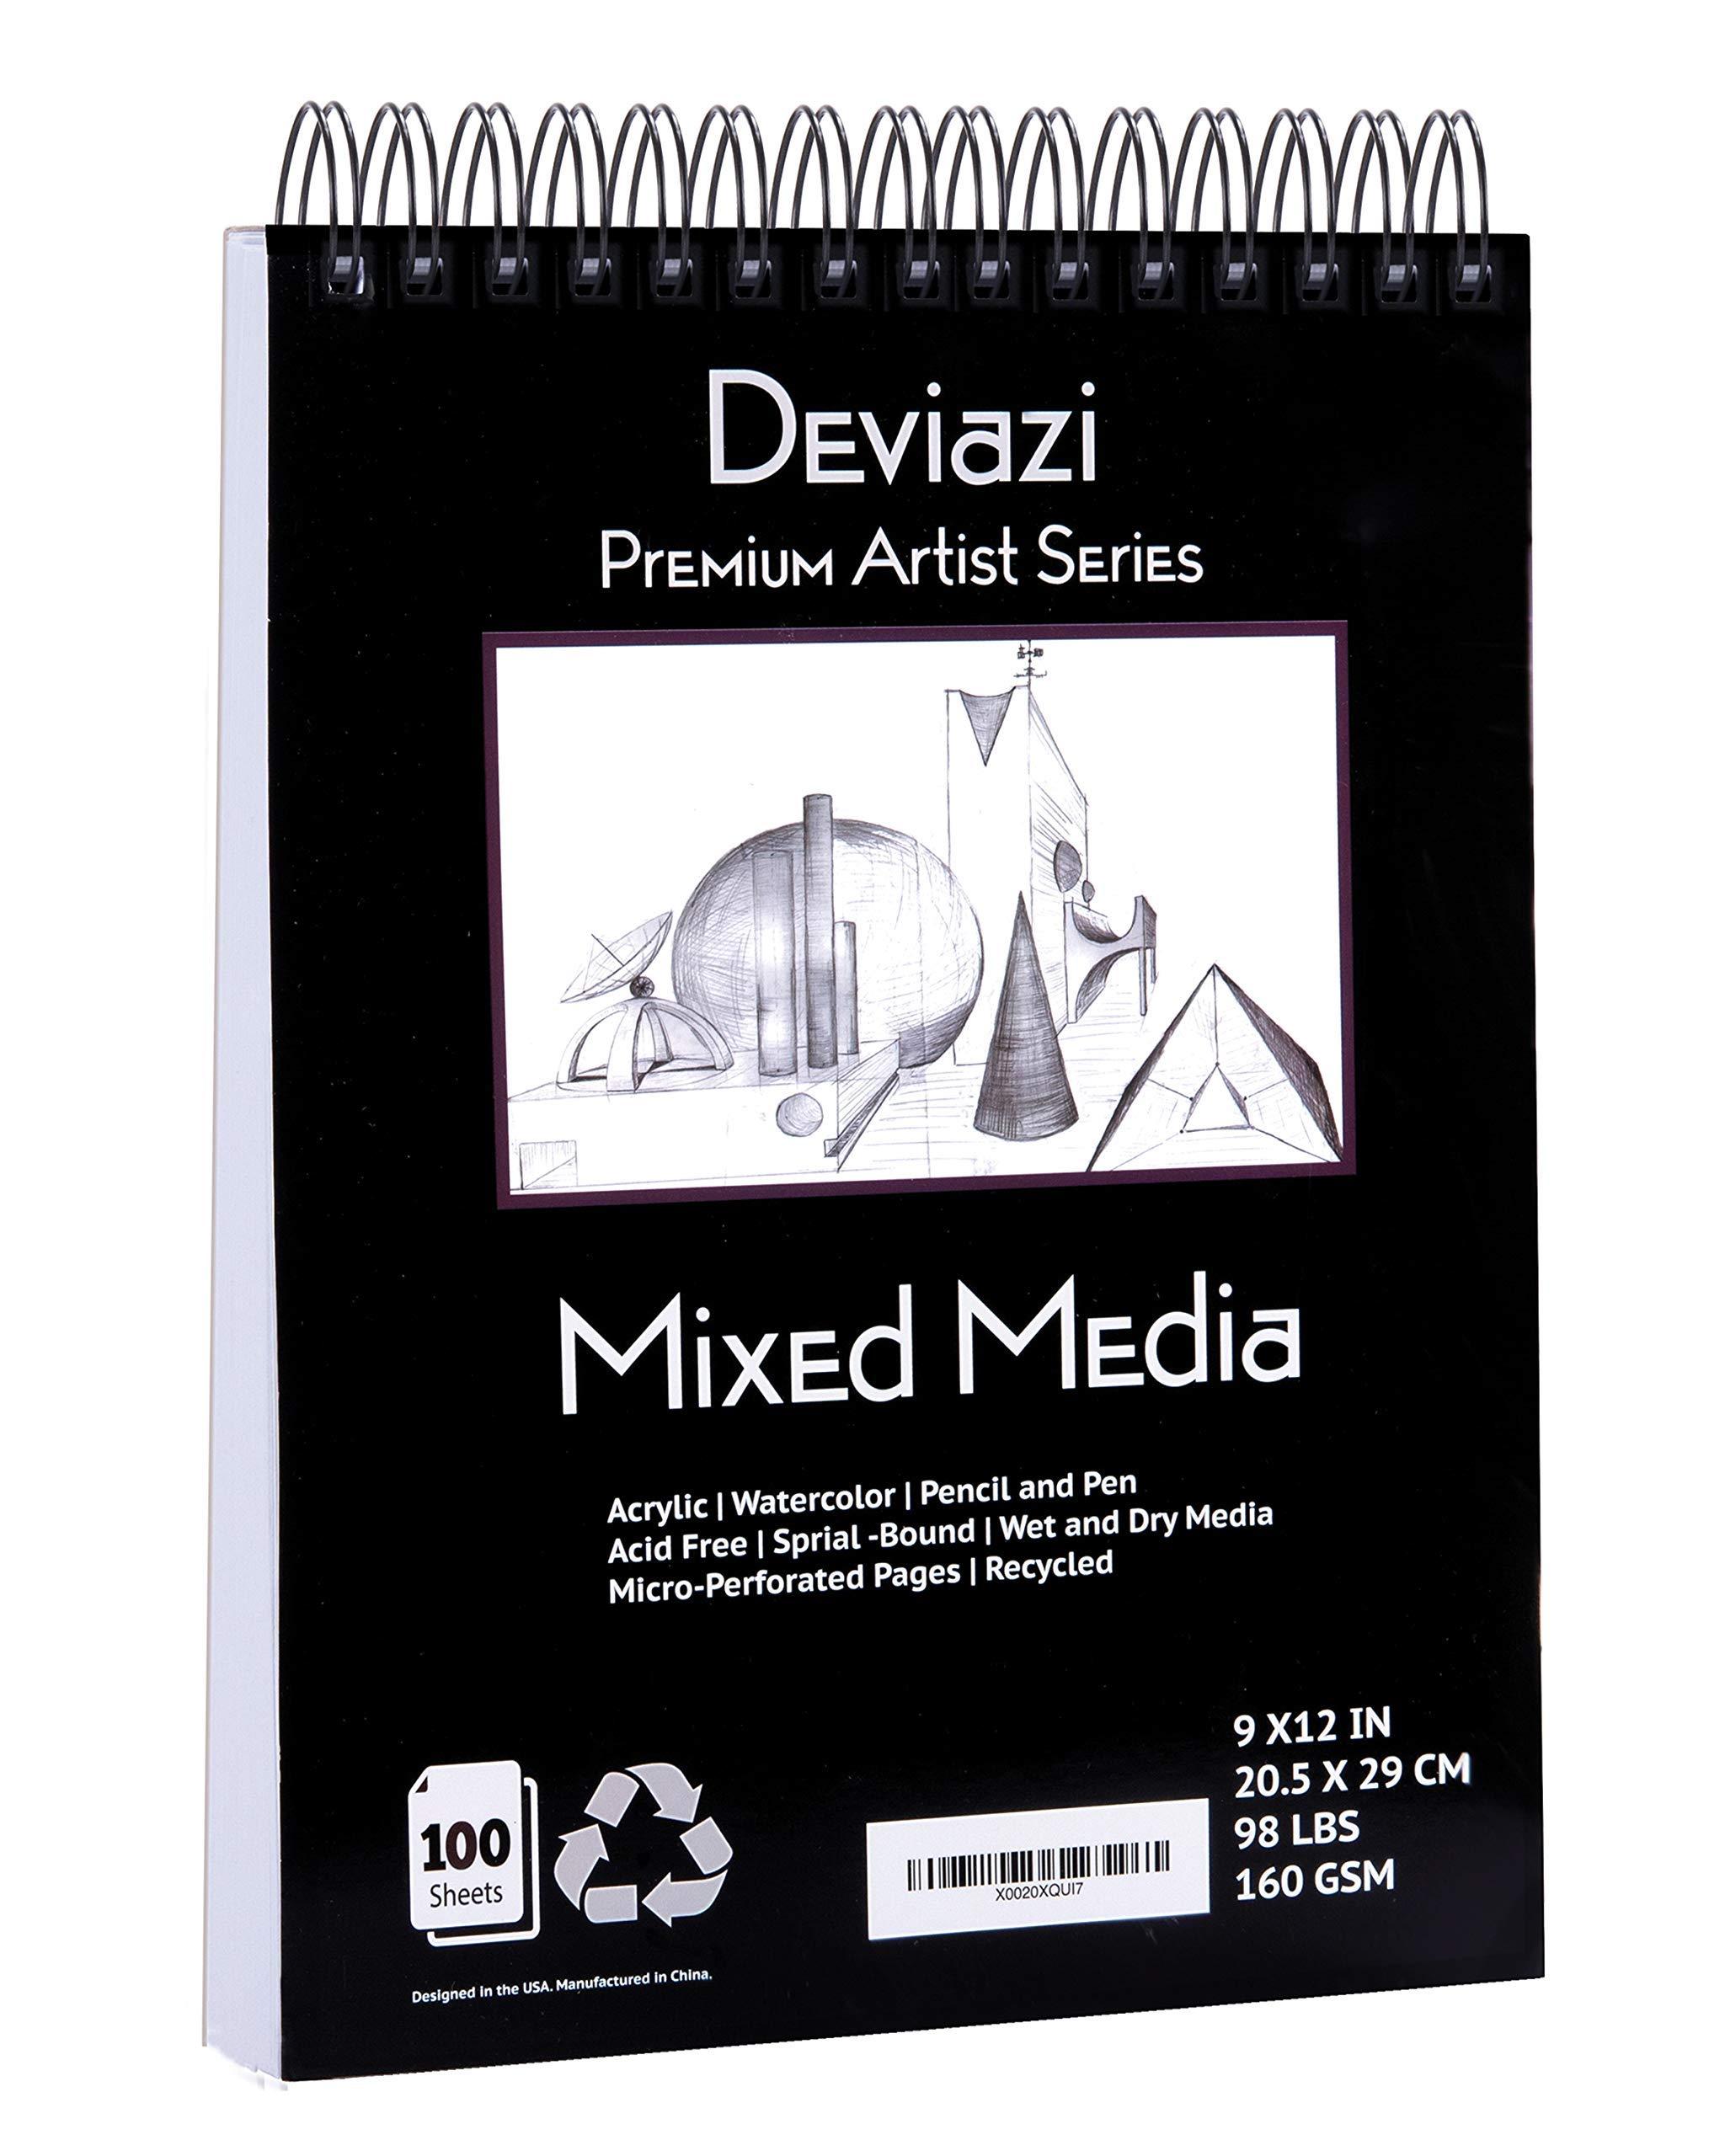 Deviazi Mixed Media Sketchbook 100-Sheets Acrylic Art Pad, Sketch Book, Watercolor   Drawing Pad, Acid-Free Paper for Drawing Paper, Painting, Sketching   Spiral Bound Sketchbook   Coloring Book by Deviazi